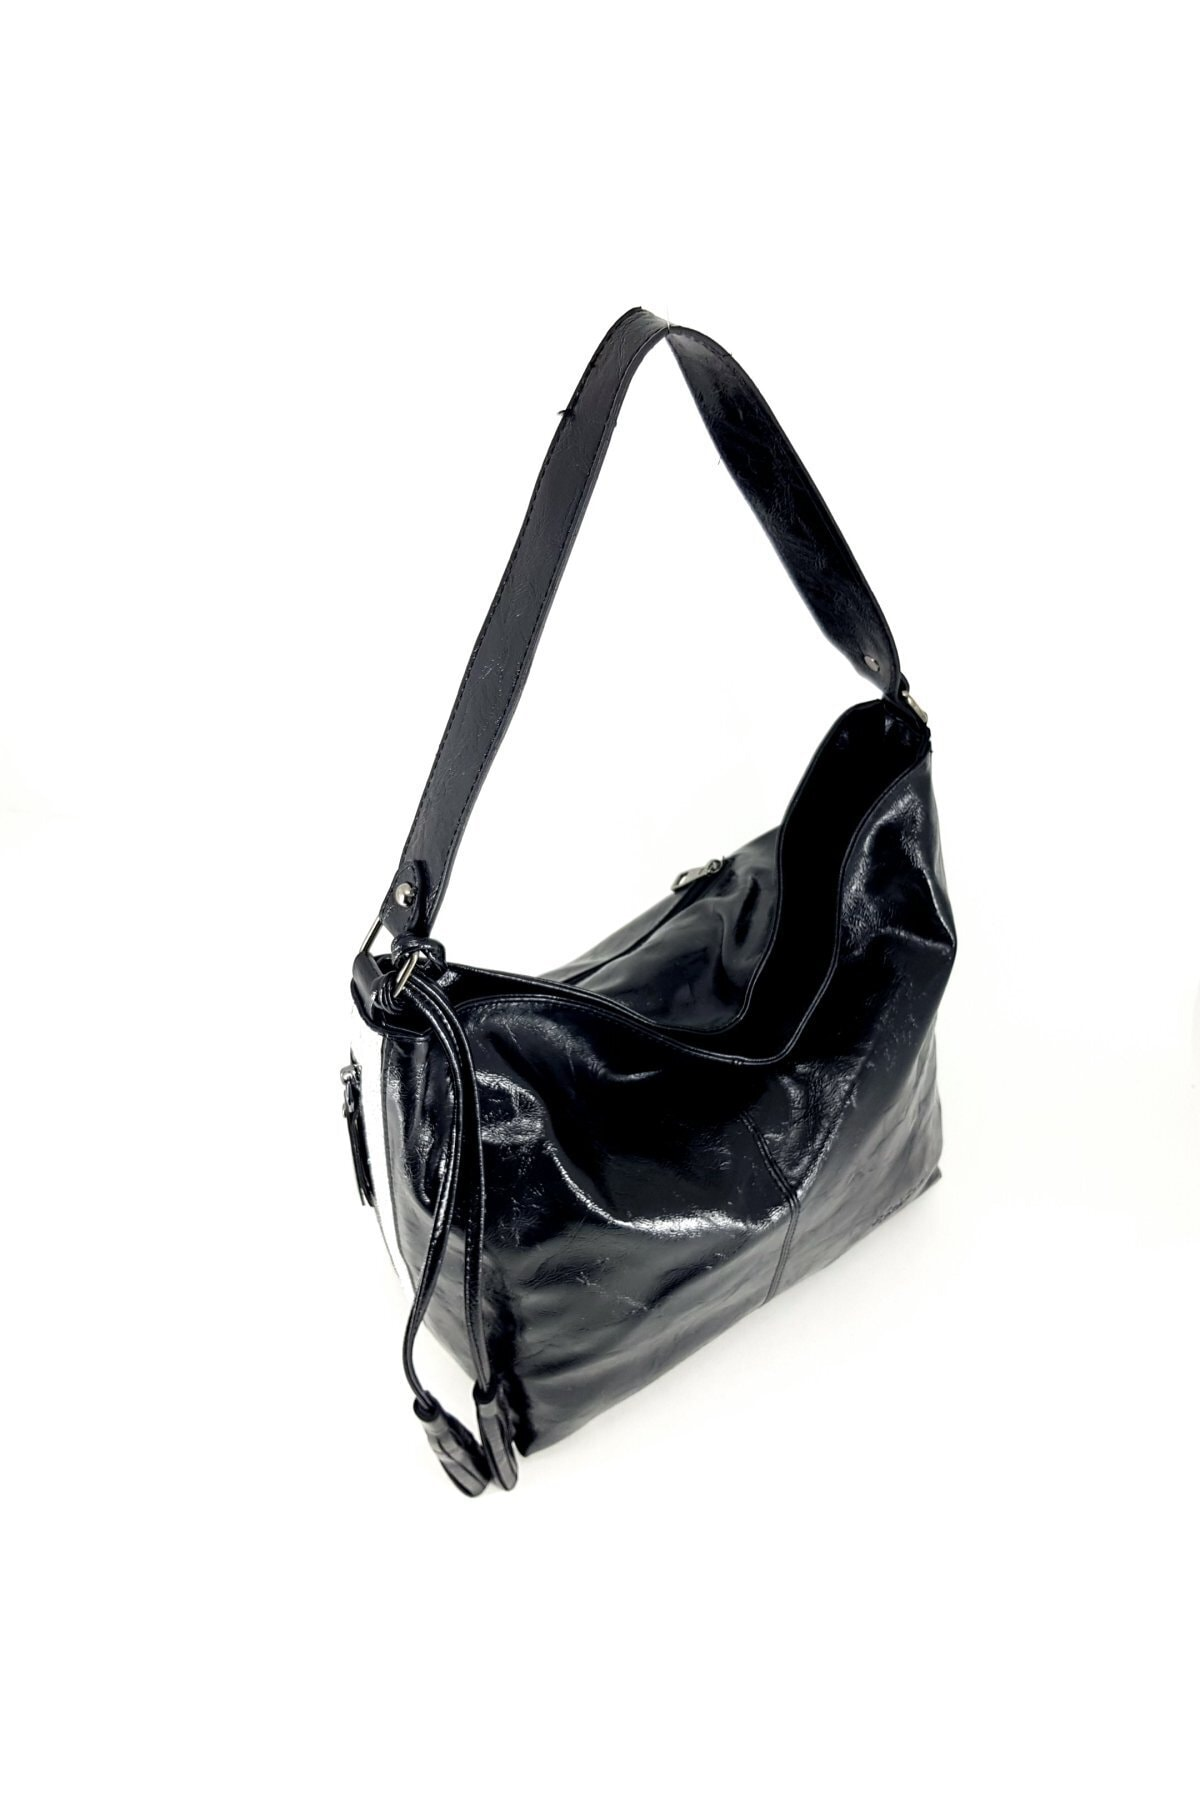 Poloorjinal Kadın Siyah Çanta 2